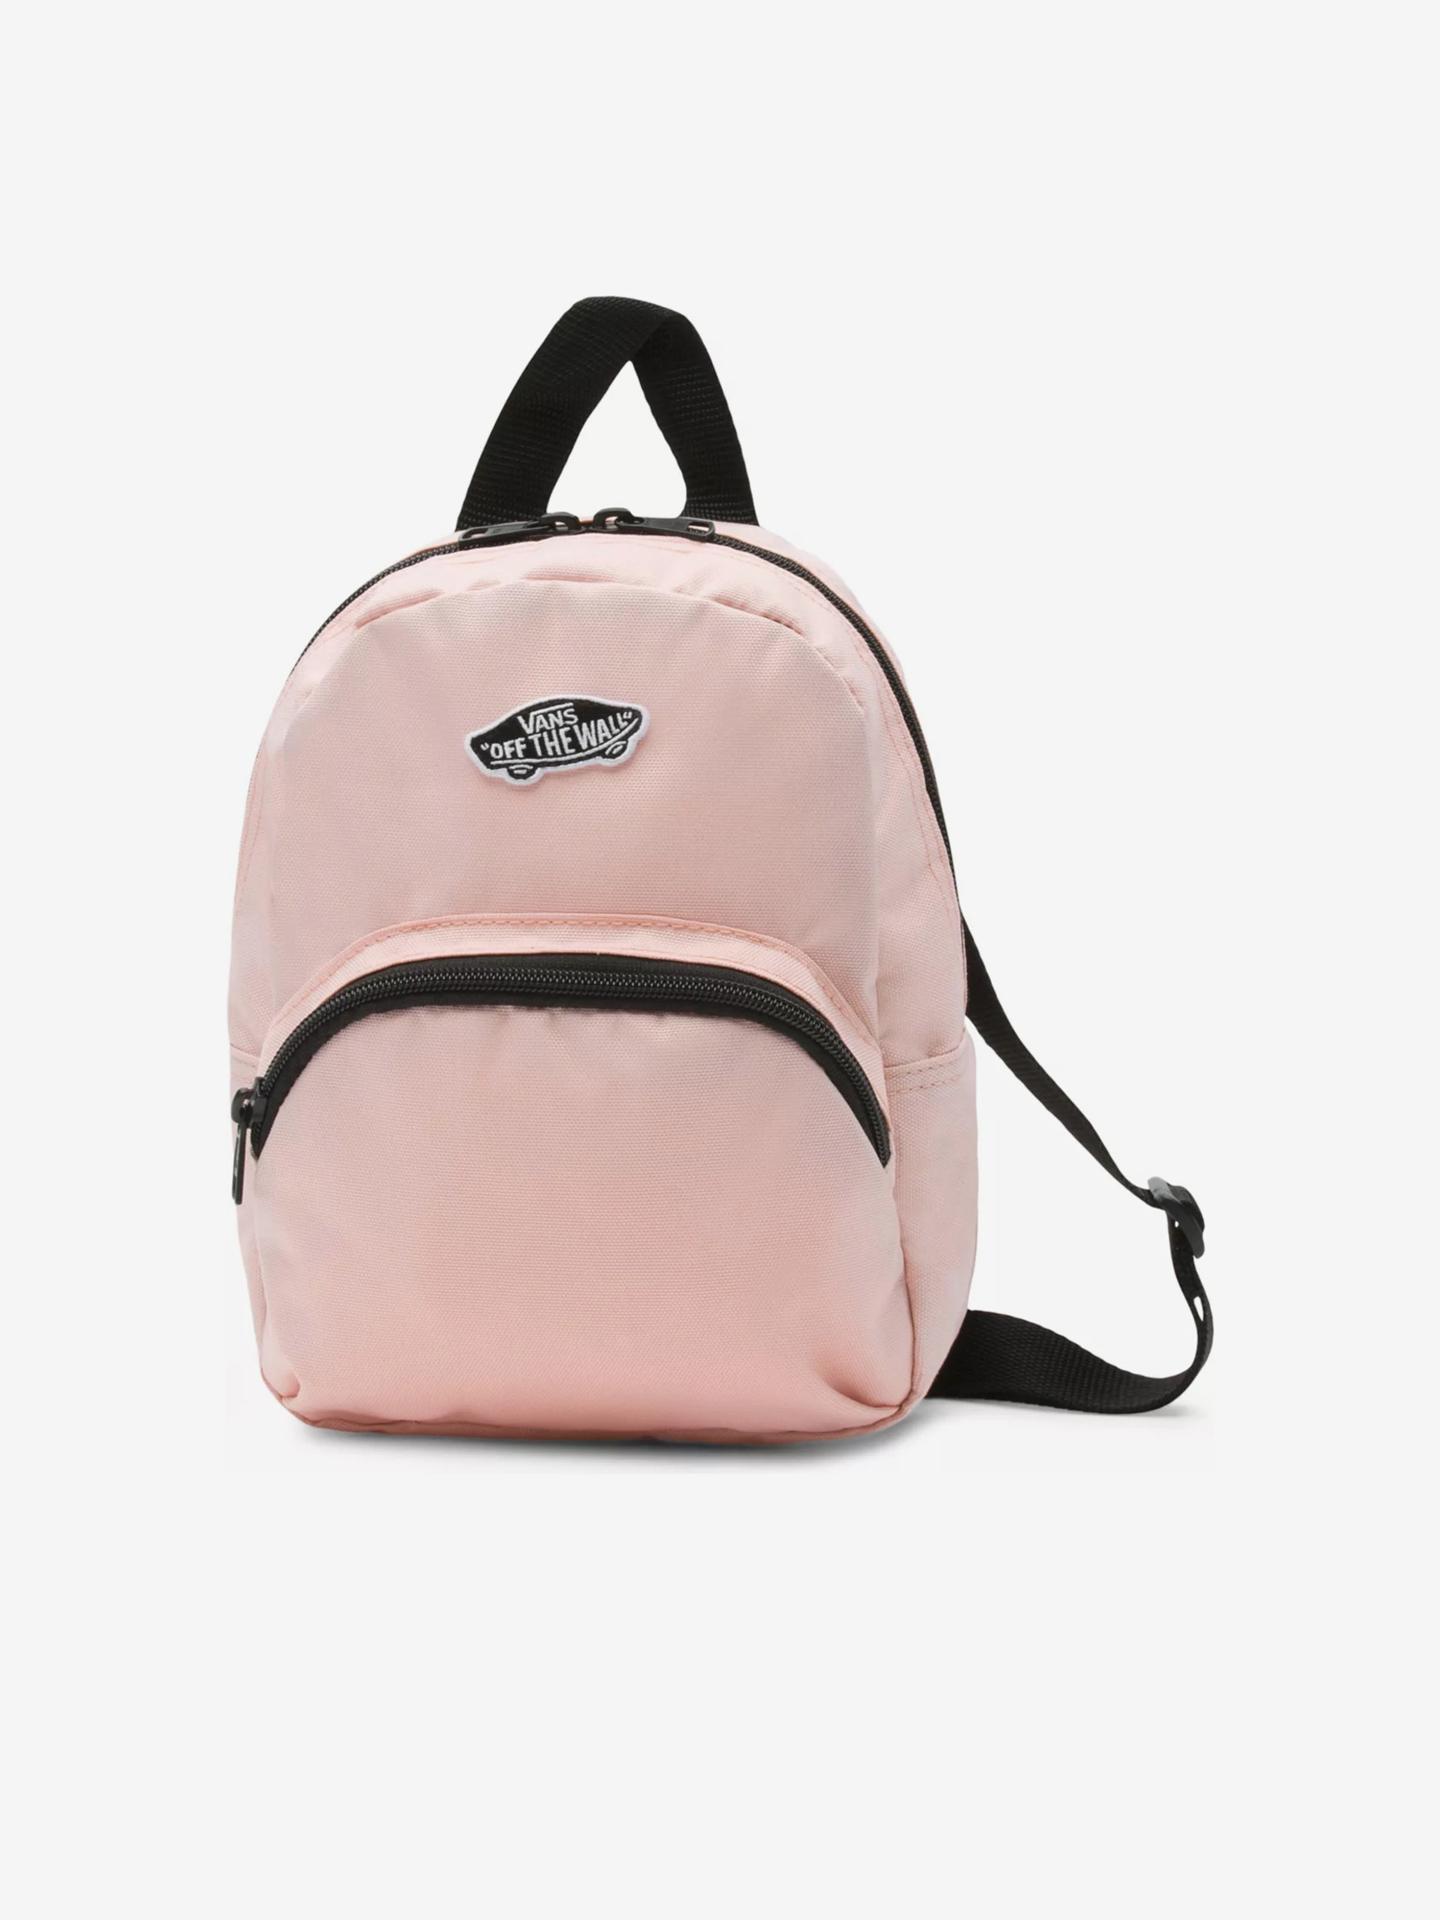 Vans roz mic rucsac Got This Mini